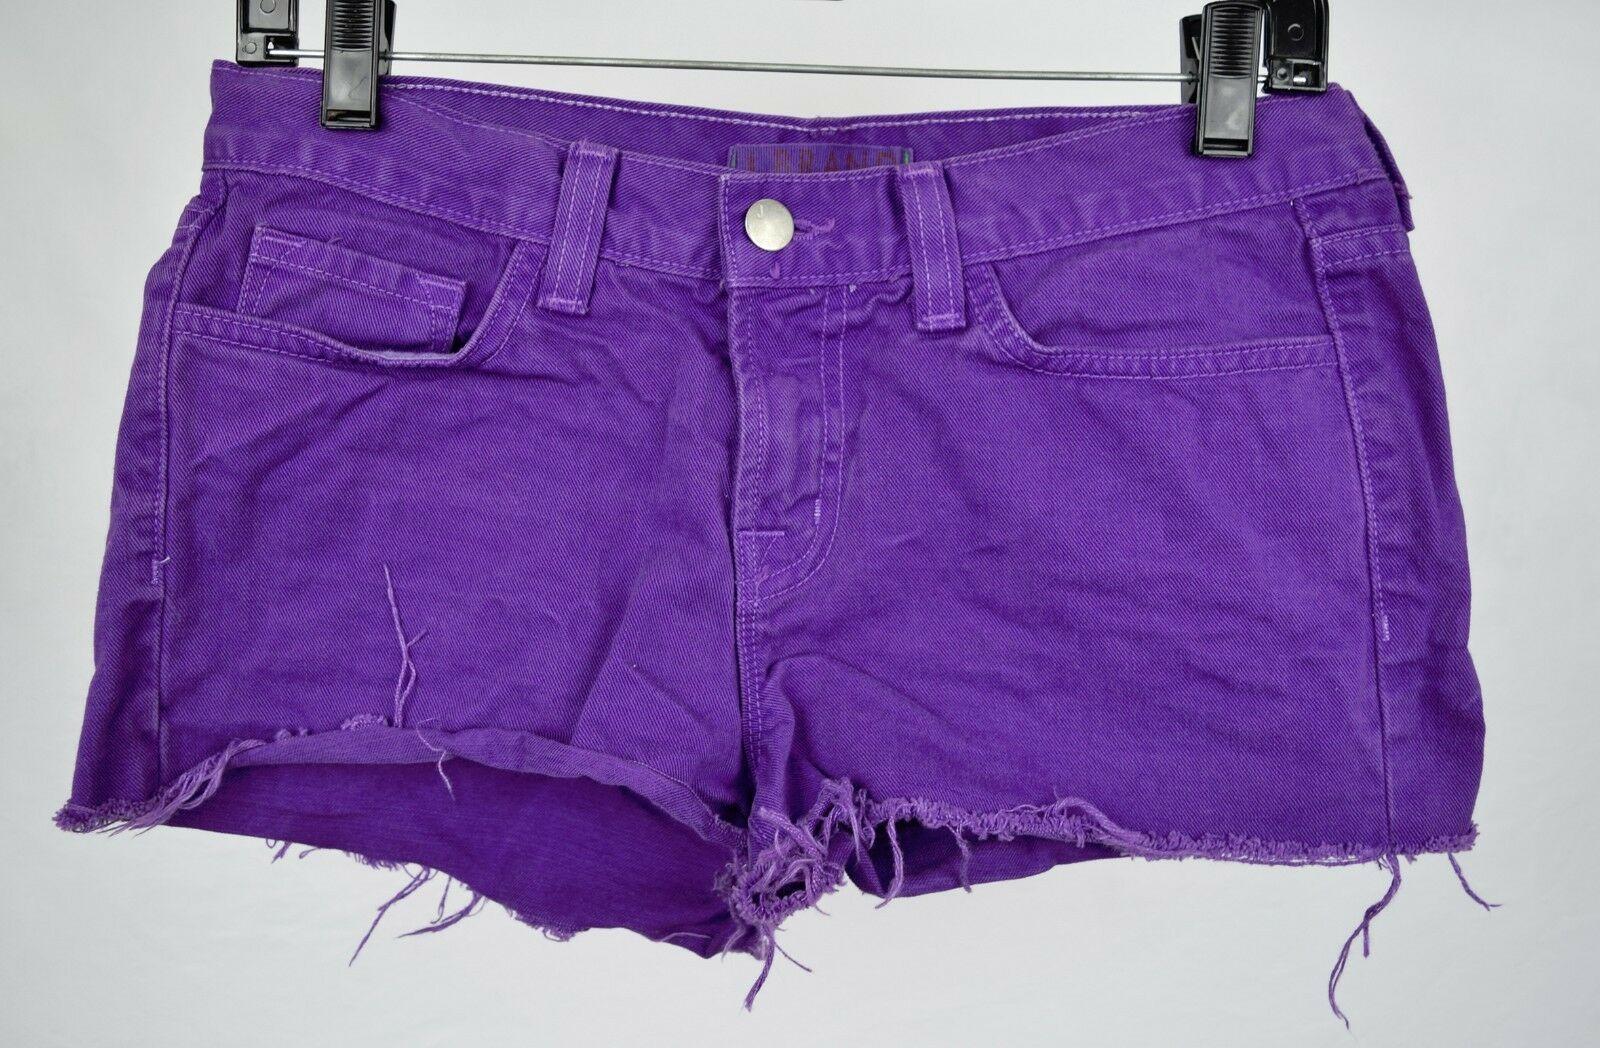 J Brand 7037 Bright Purple Cut Off Short Jeans 26 Womens USA image 6